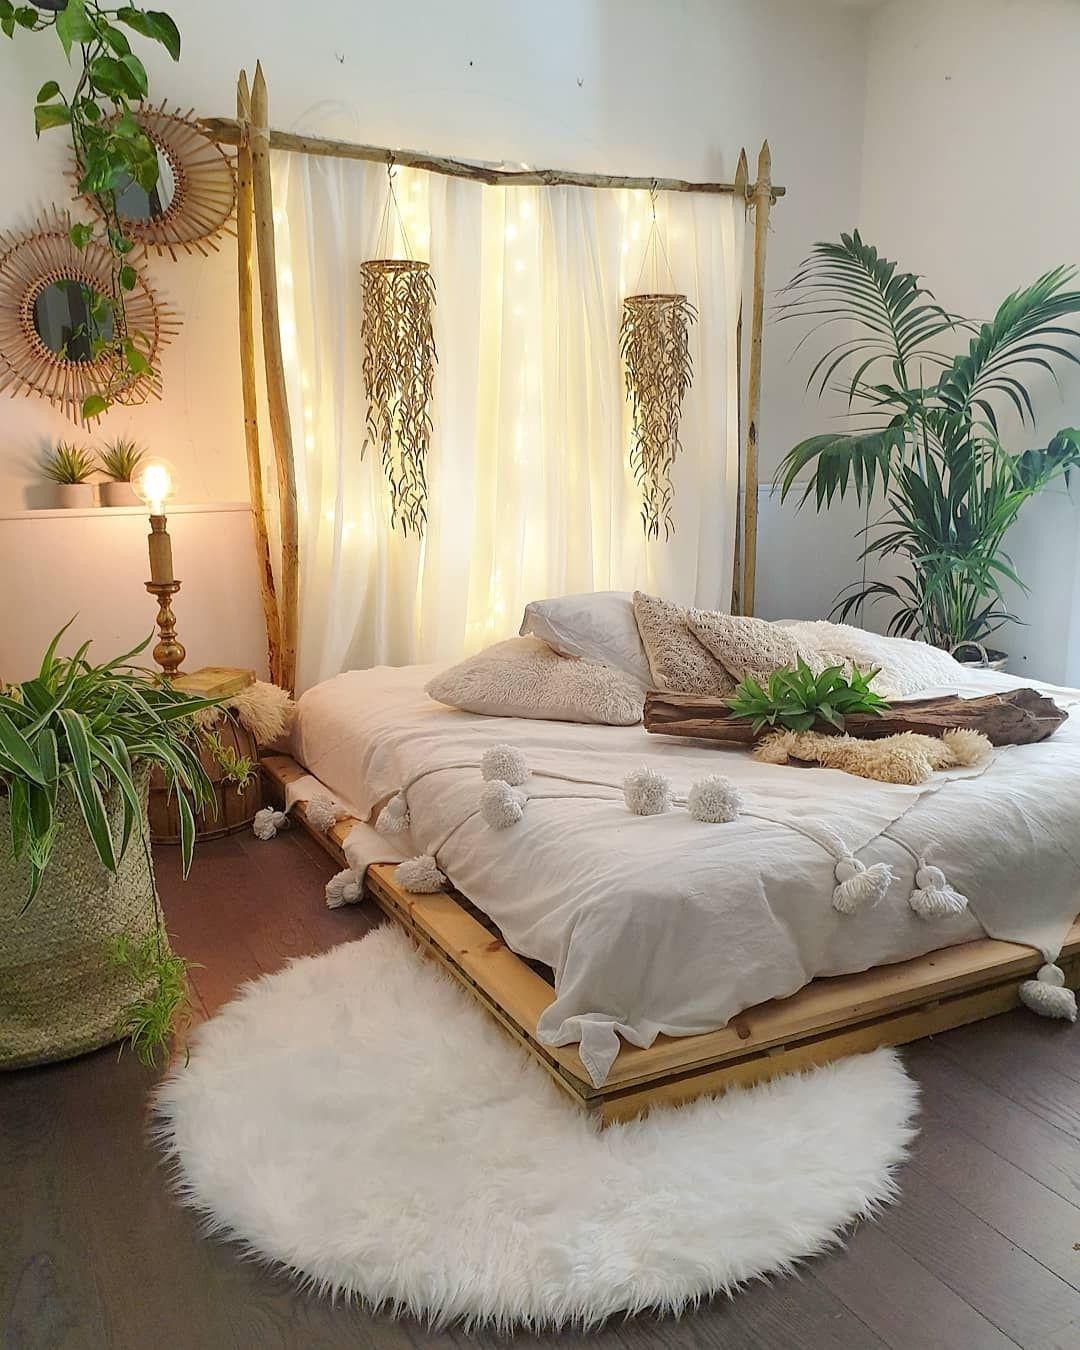 Circle furry rug on bed corner